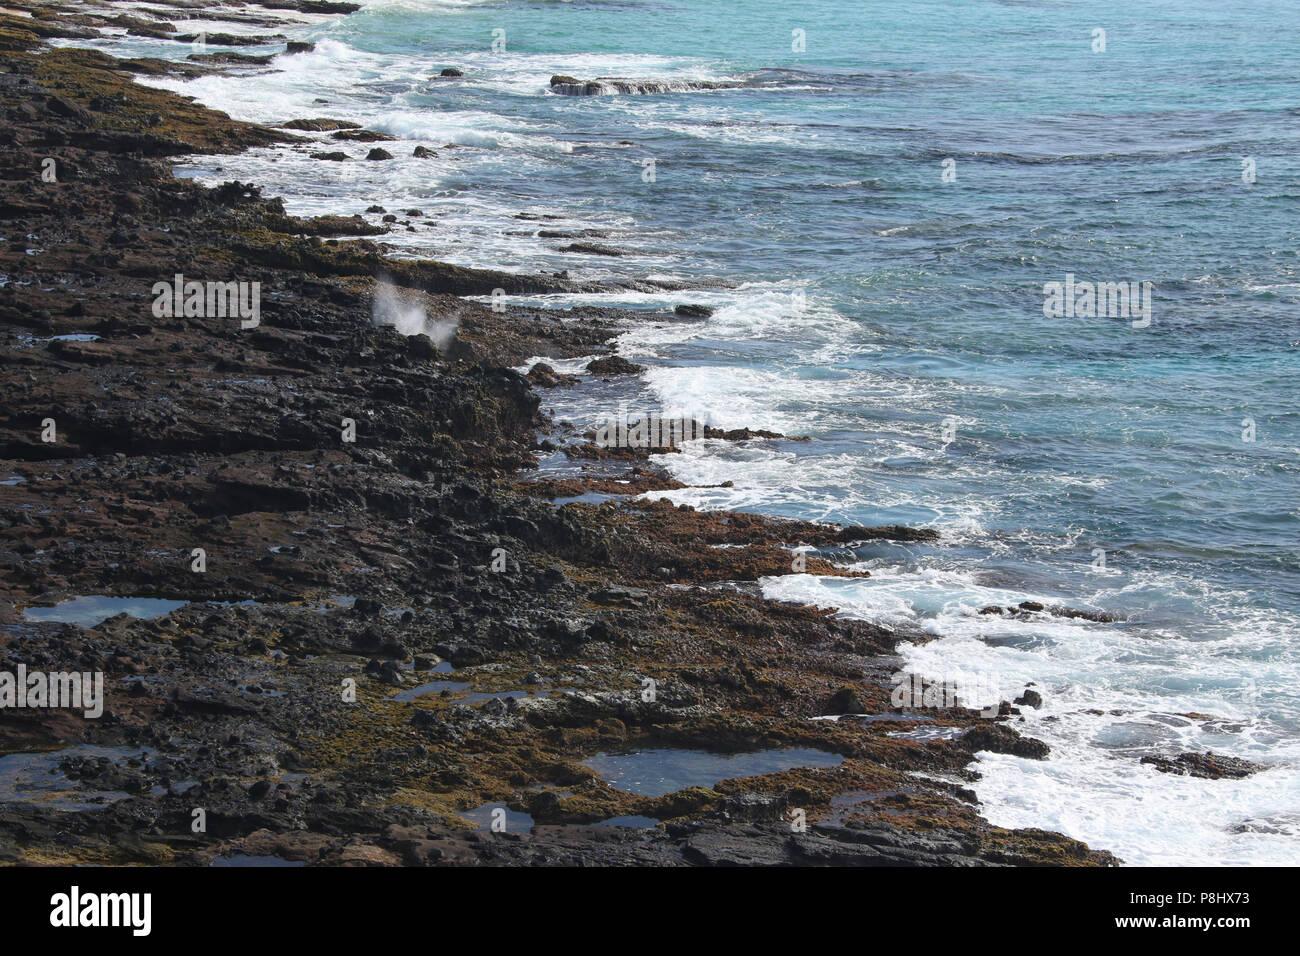 Vulkangestein Shoreline ab dem halona Loch Lookout gesehen. Insel Oahu, Hawaii, USA. Stockbild